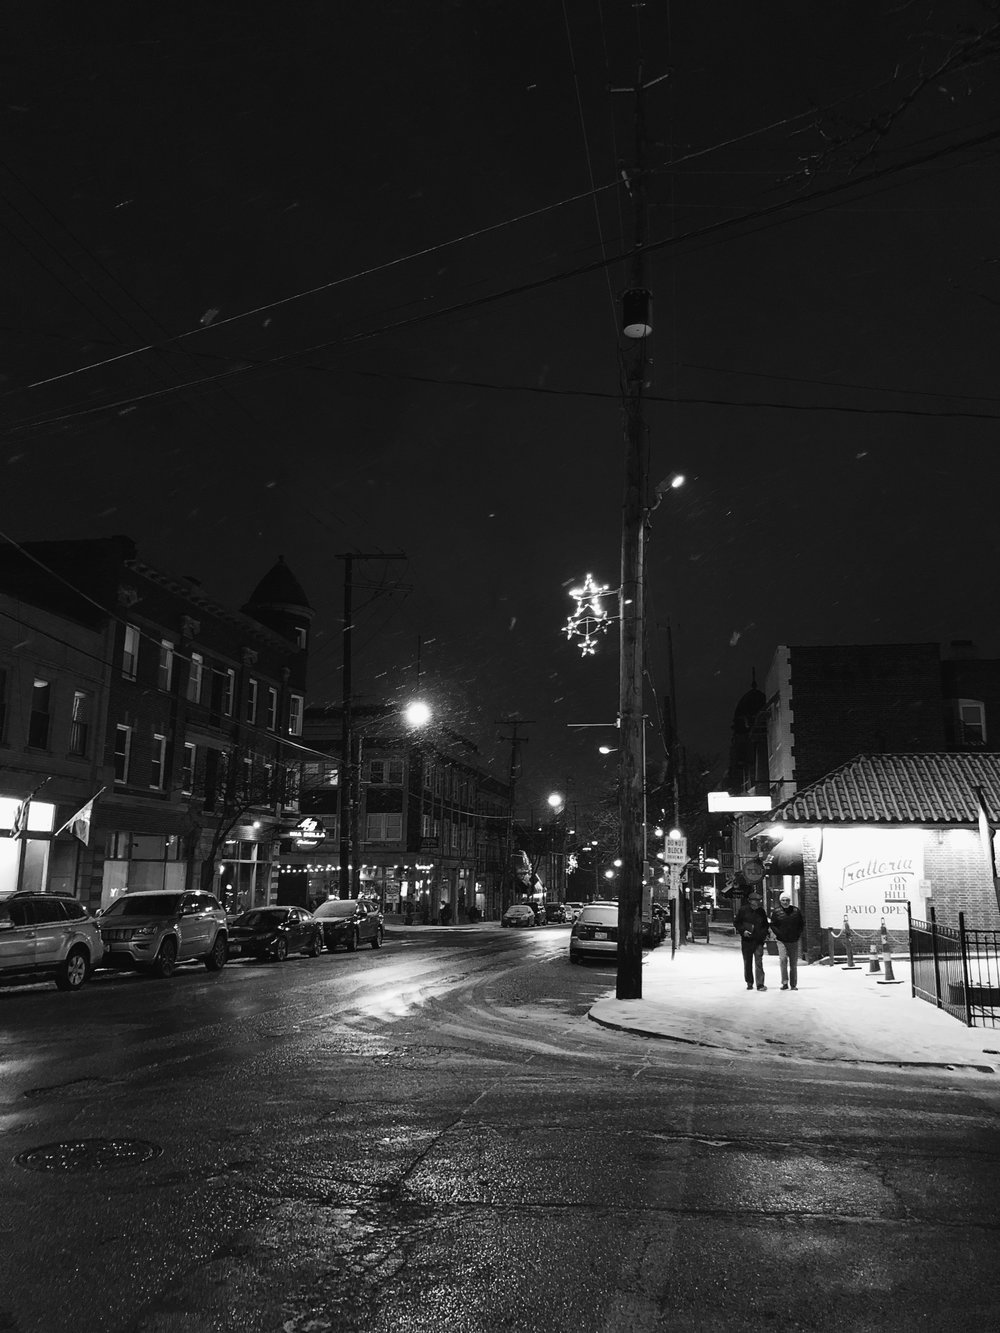 Night time snow falls